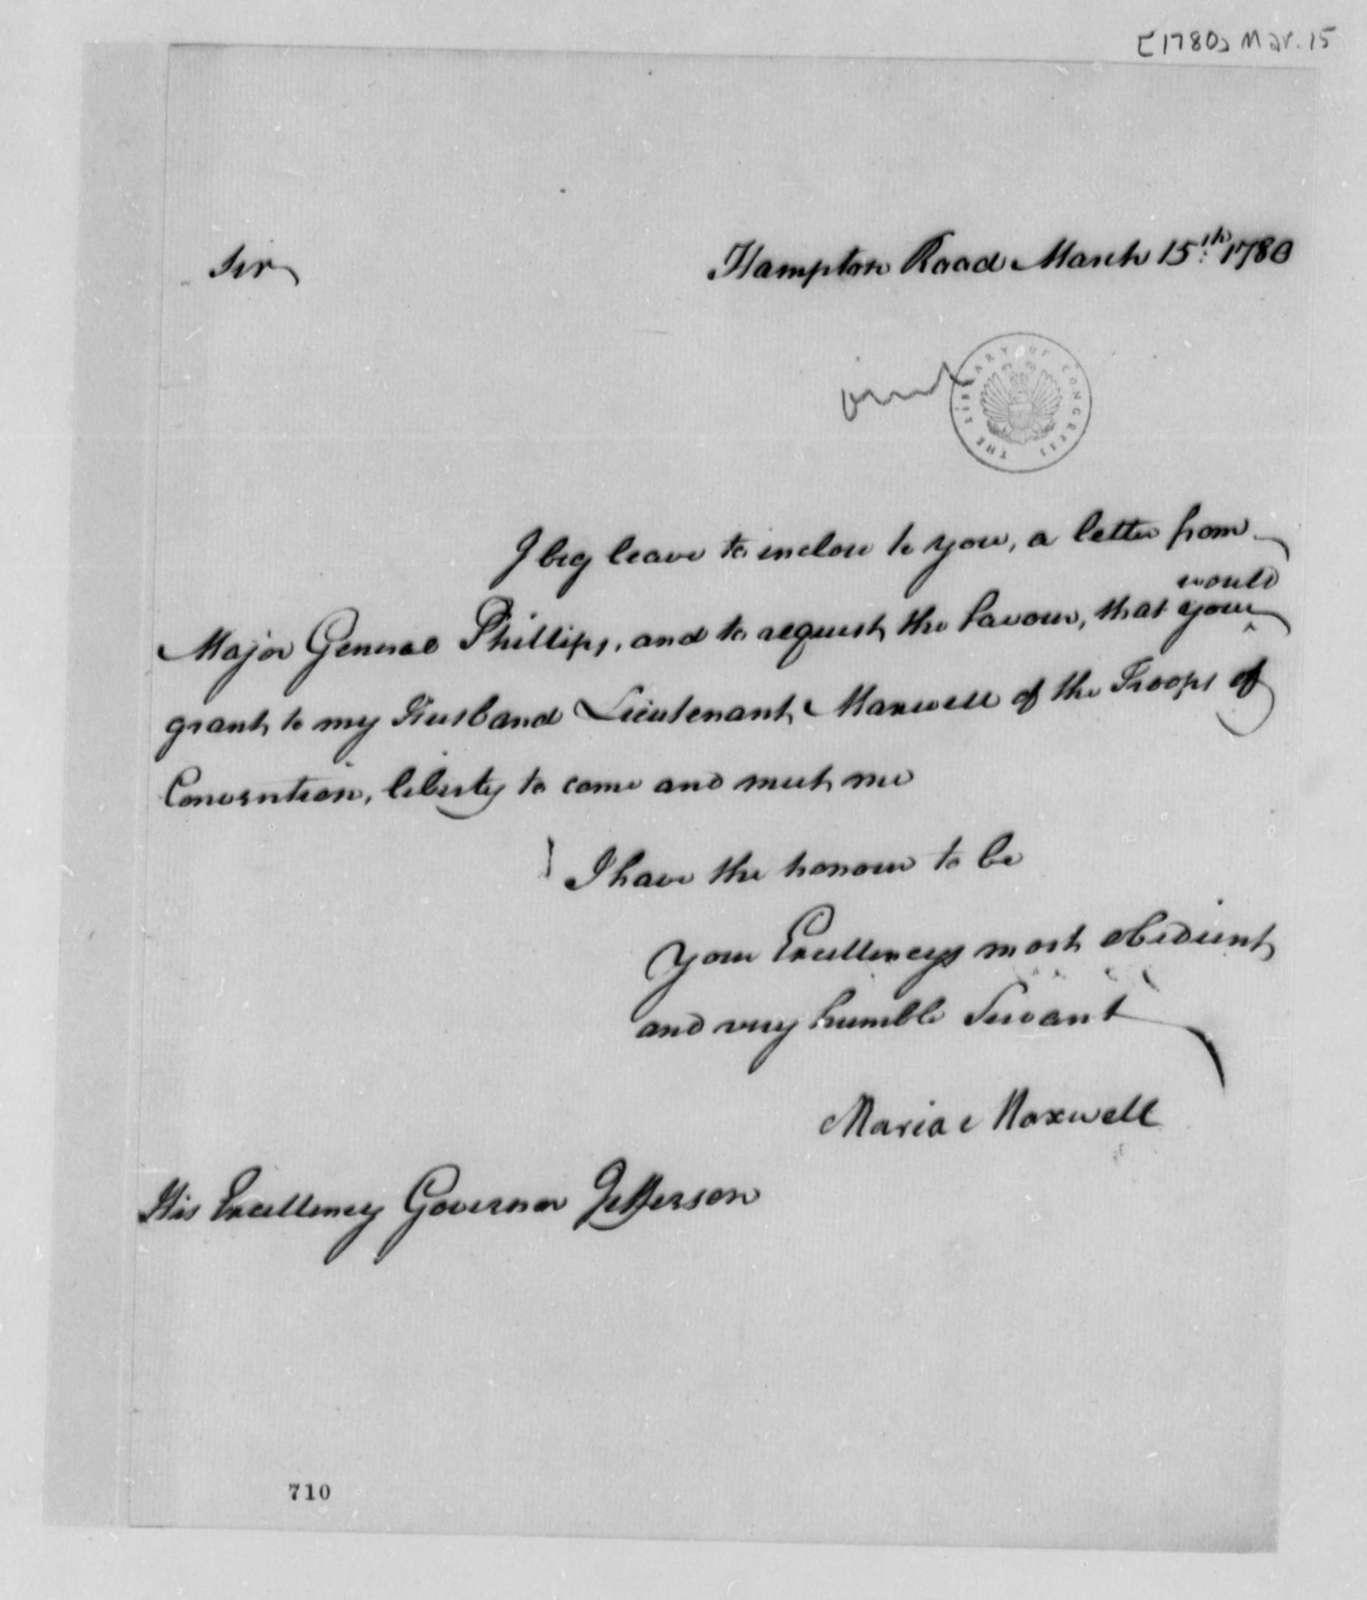 Maria Maxwell to Thomas Jefferson, March 15, 1780